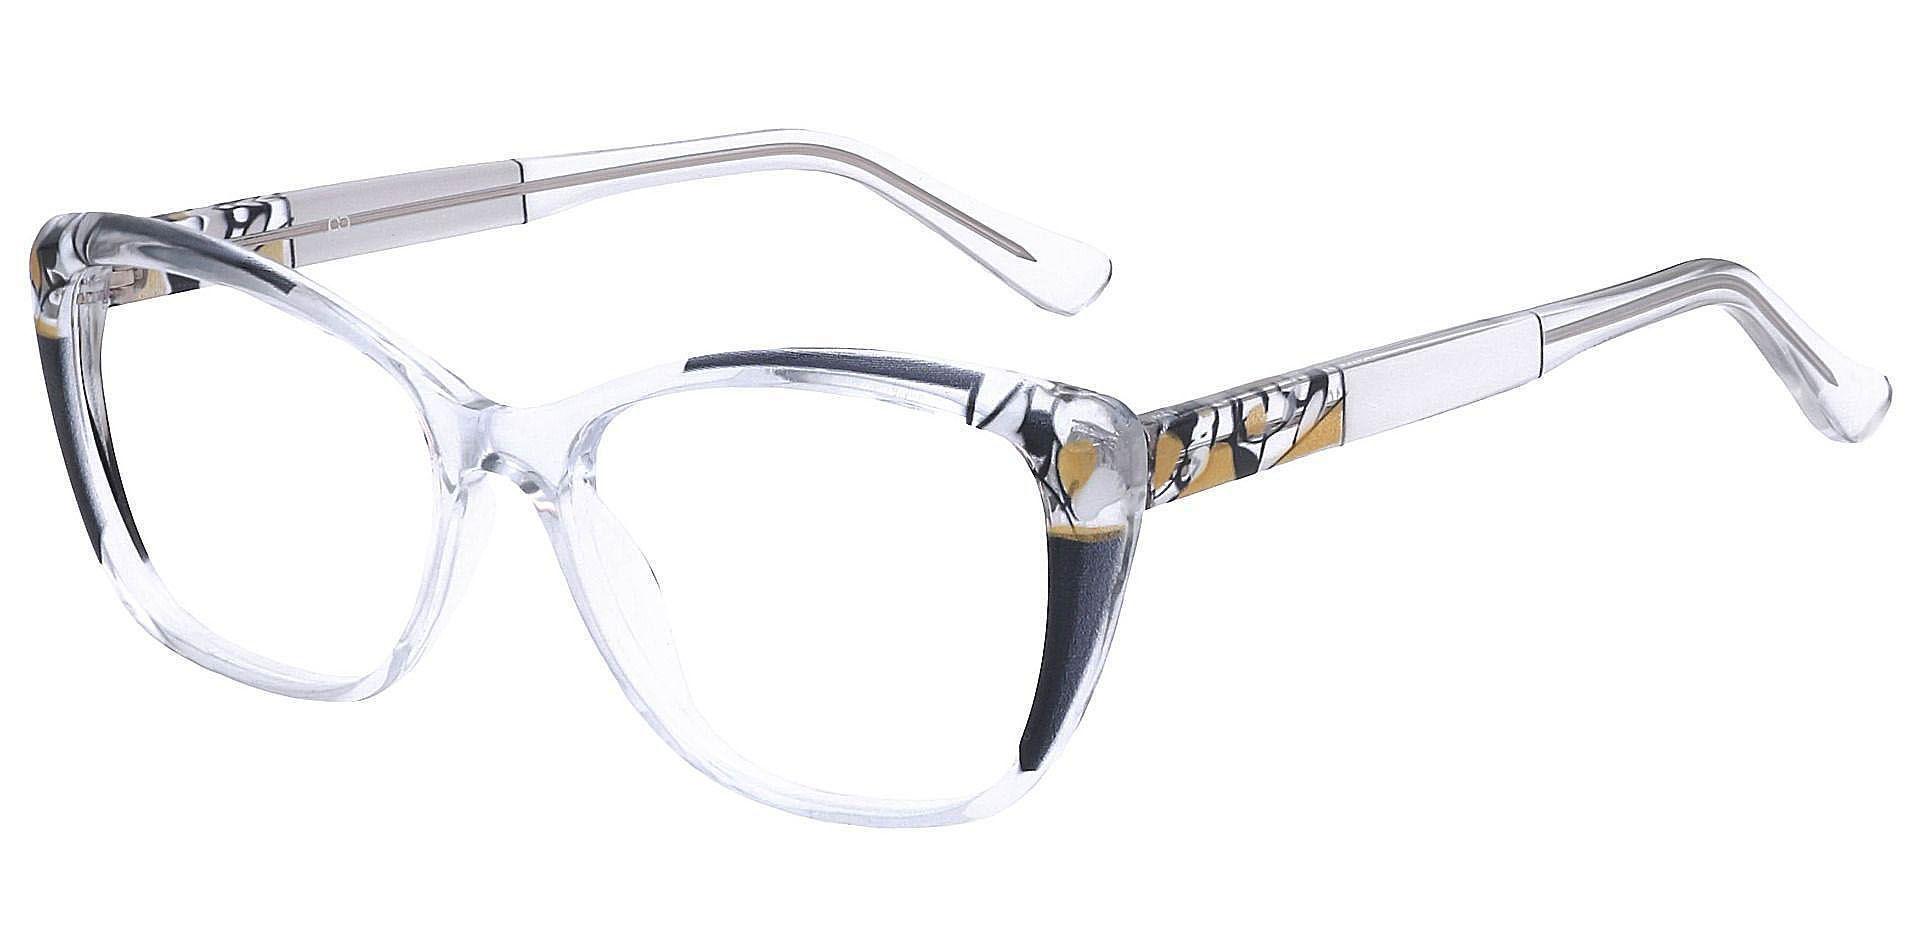 Marina Cat Eye Prescription Glasses - Black